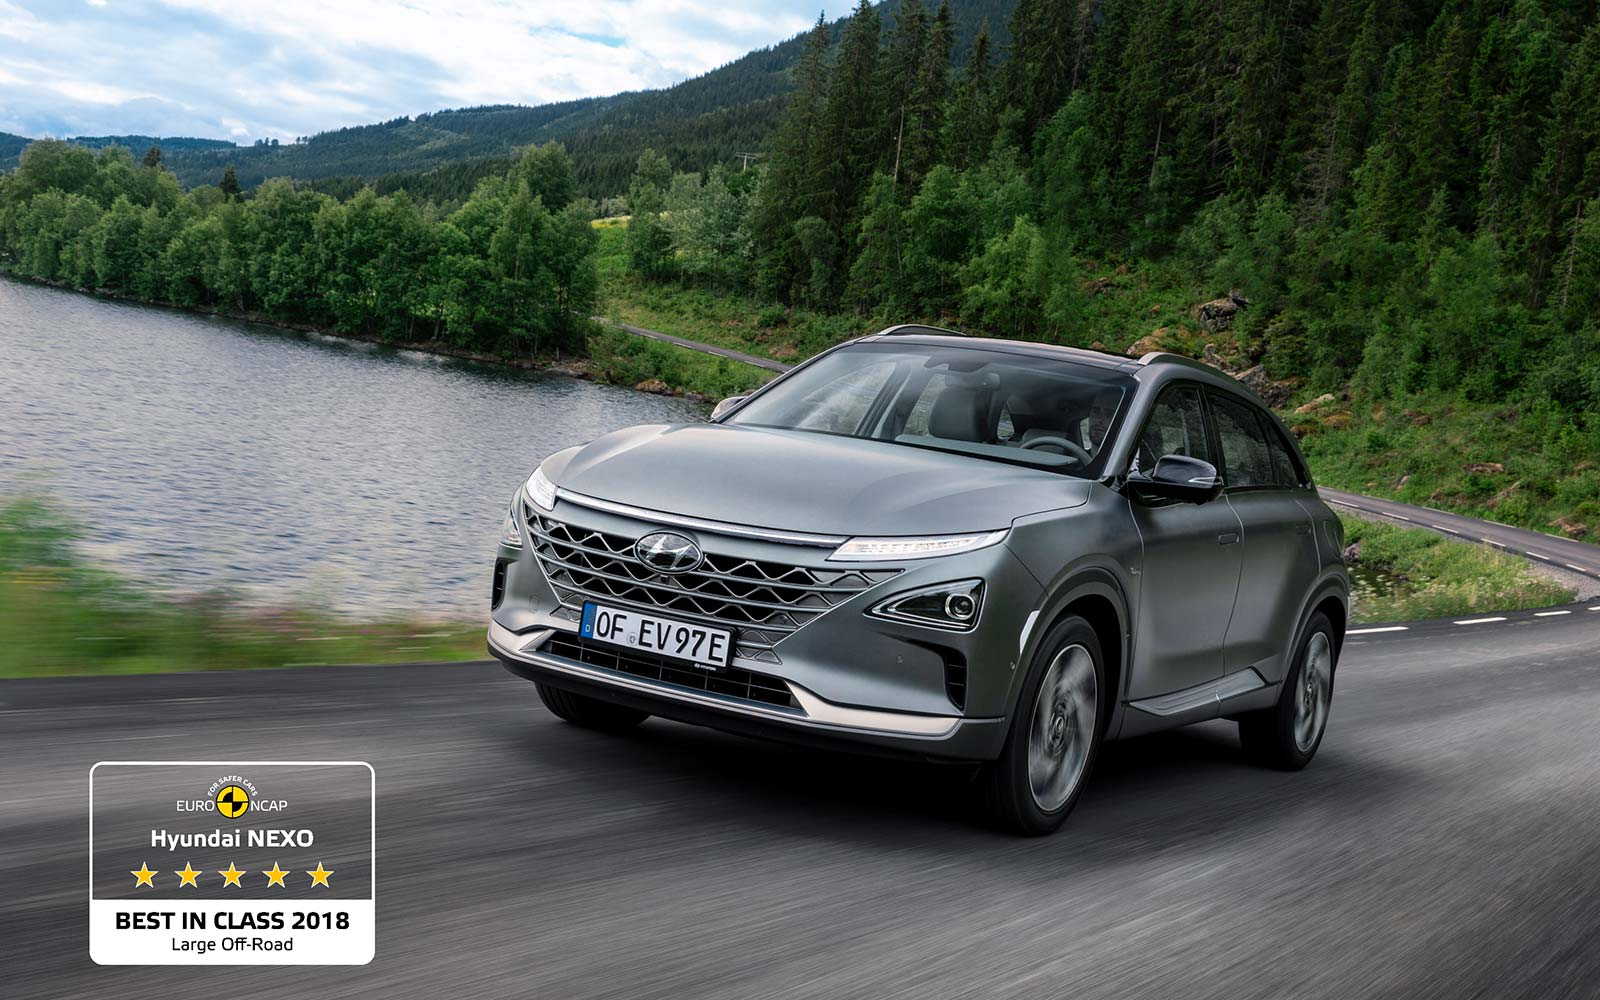 Hyundai NEXO Best in Class 20181